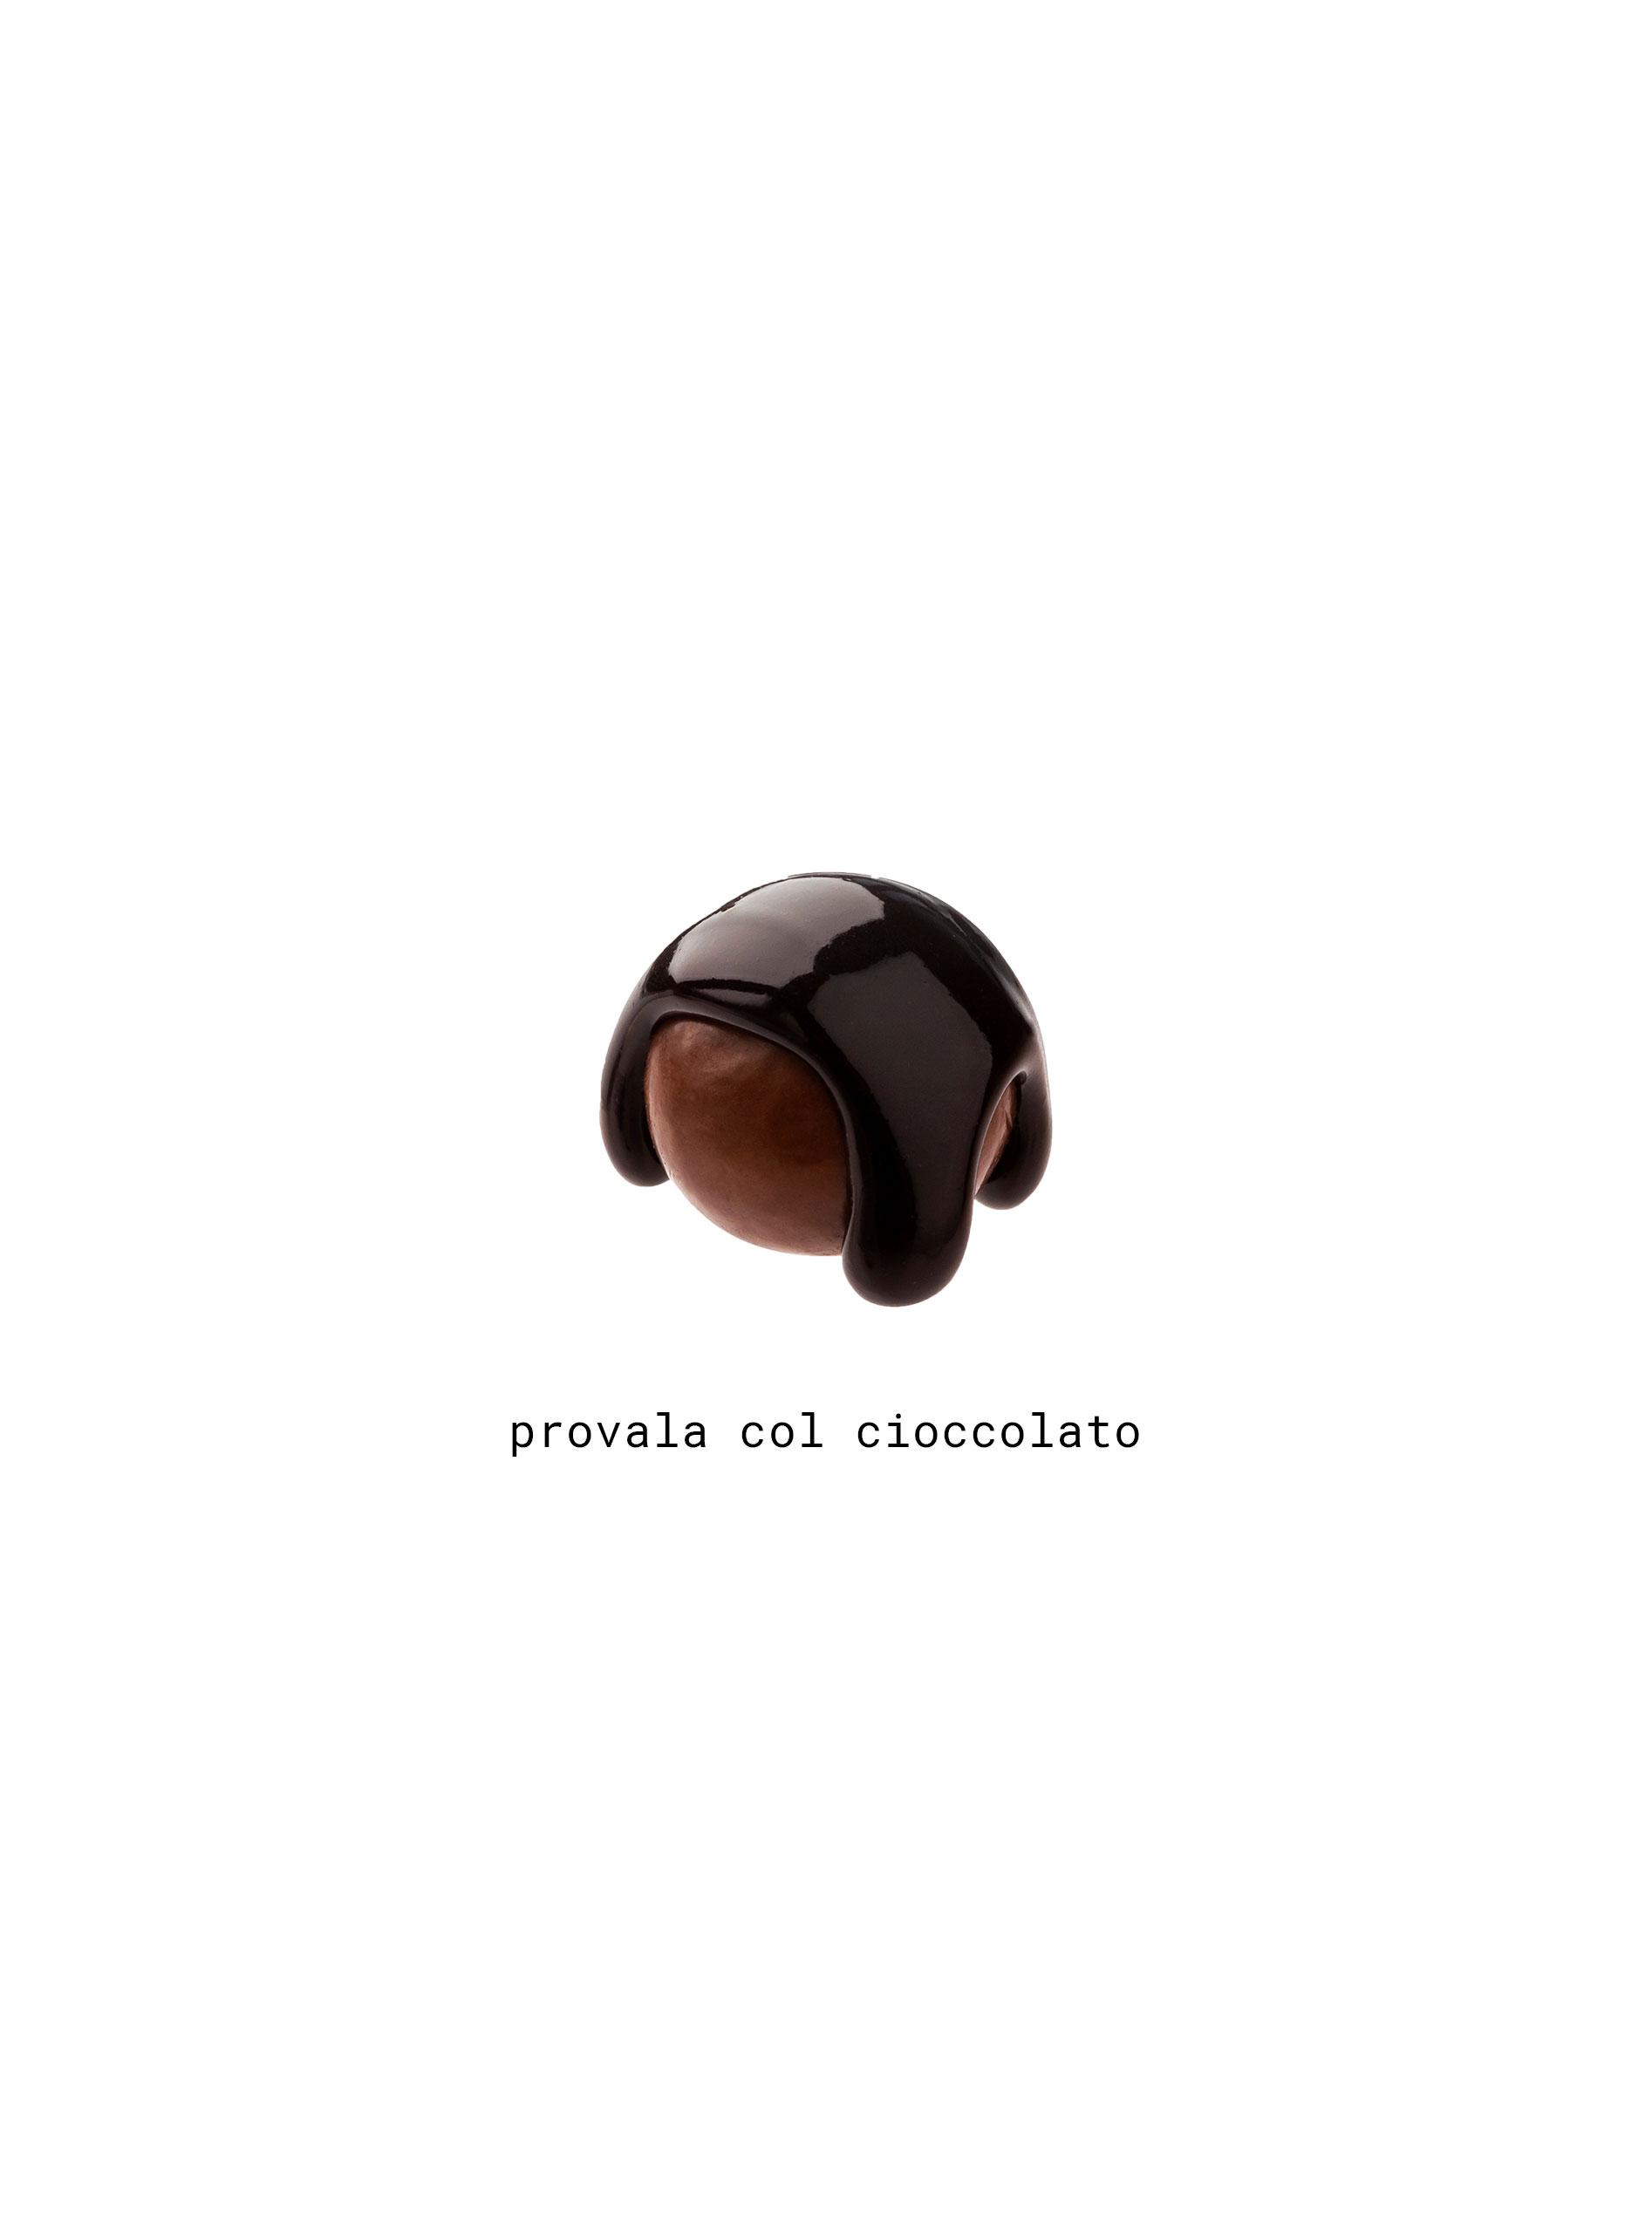 stout-provala-col-cioccolato